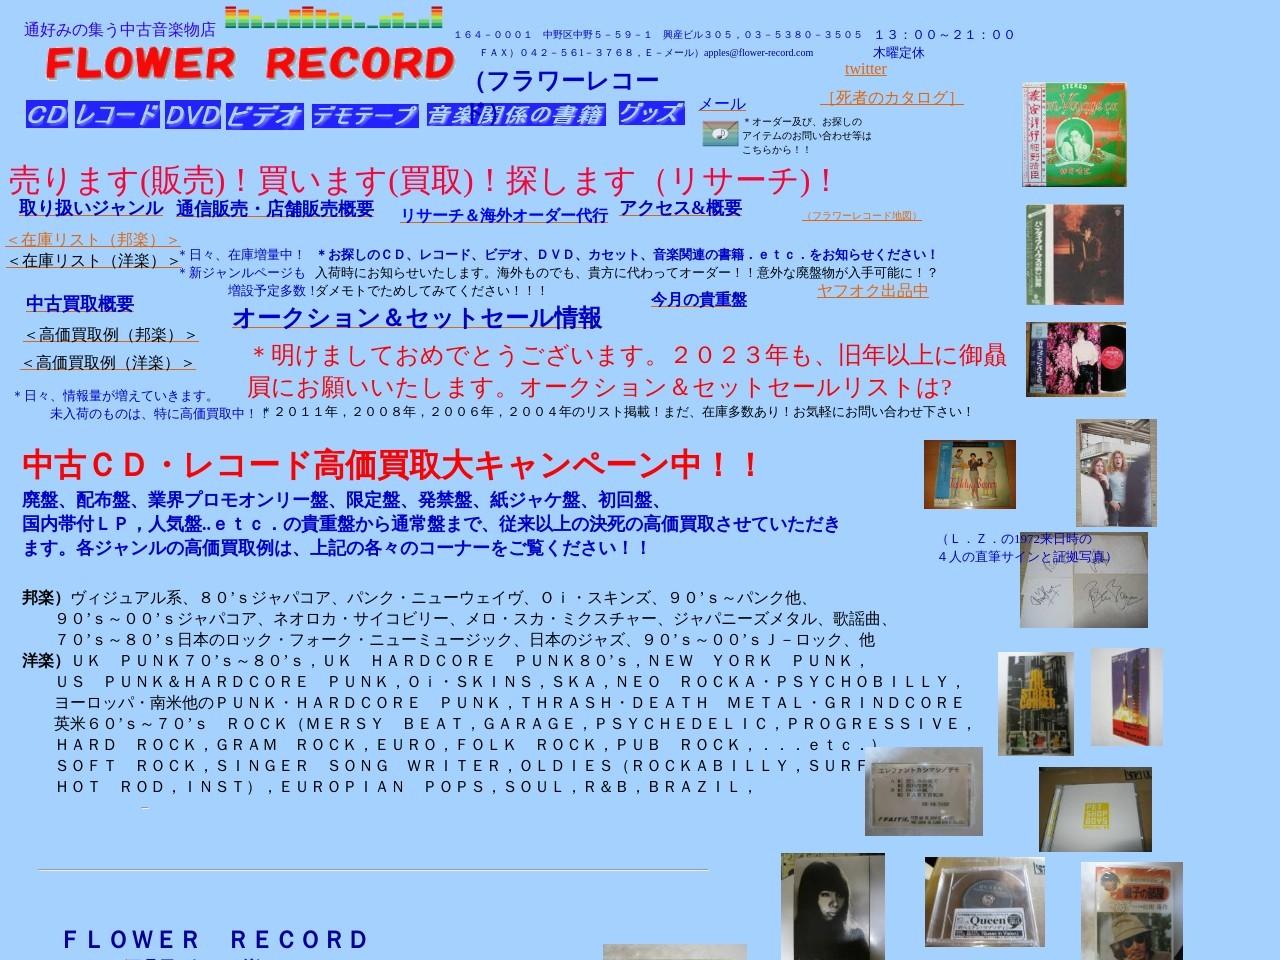 FLOWER RECORD(フラワーレコード) 買取 中古CD レコード DVD 音楽関連書籍 販売 通販 リサーチ